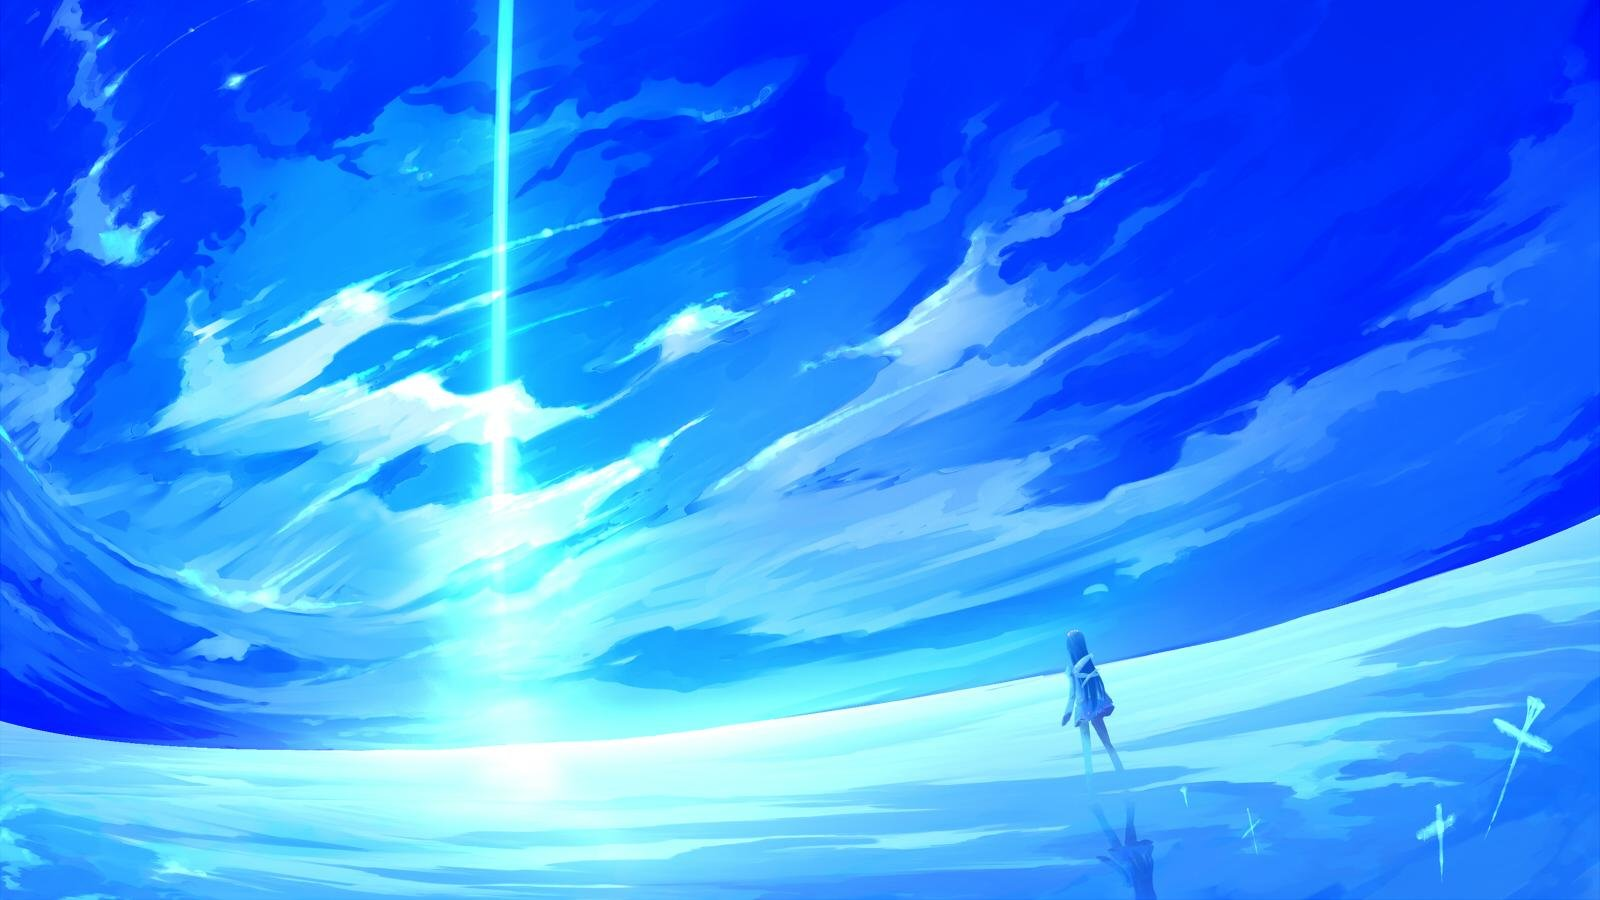 Best Cool Anime Wallpaper Id Anime Wallpaper Pc 1600x900 Download Hd Wallpaper Wallpapertip